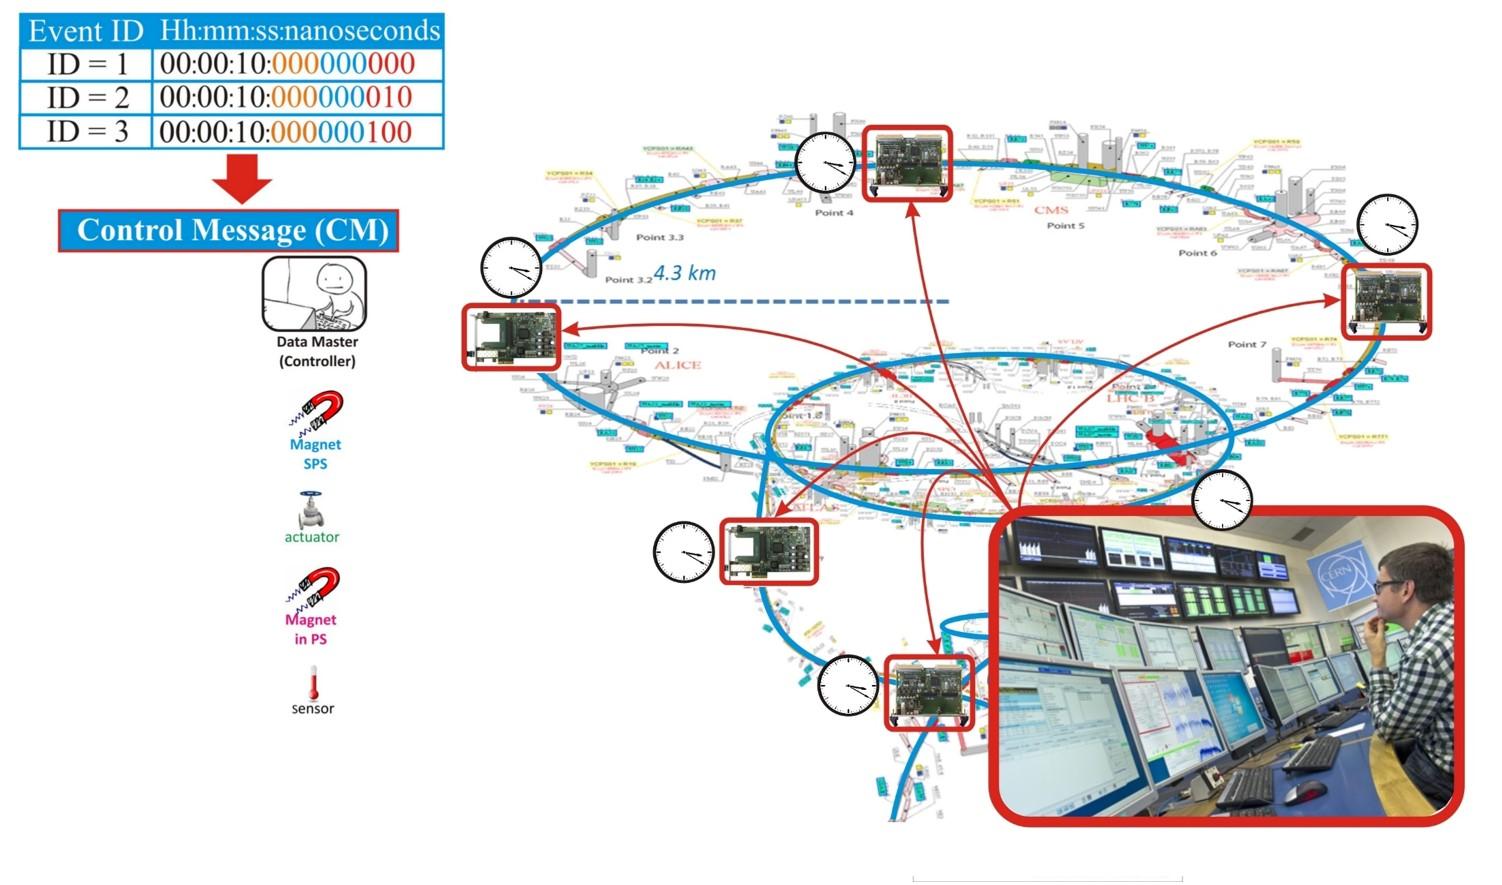 figures/applications/CERN/Determinism+synchronization-2.jpg